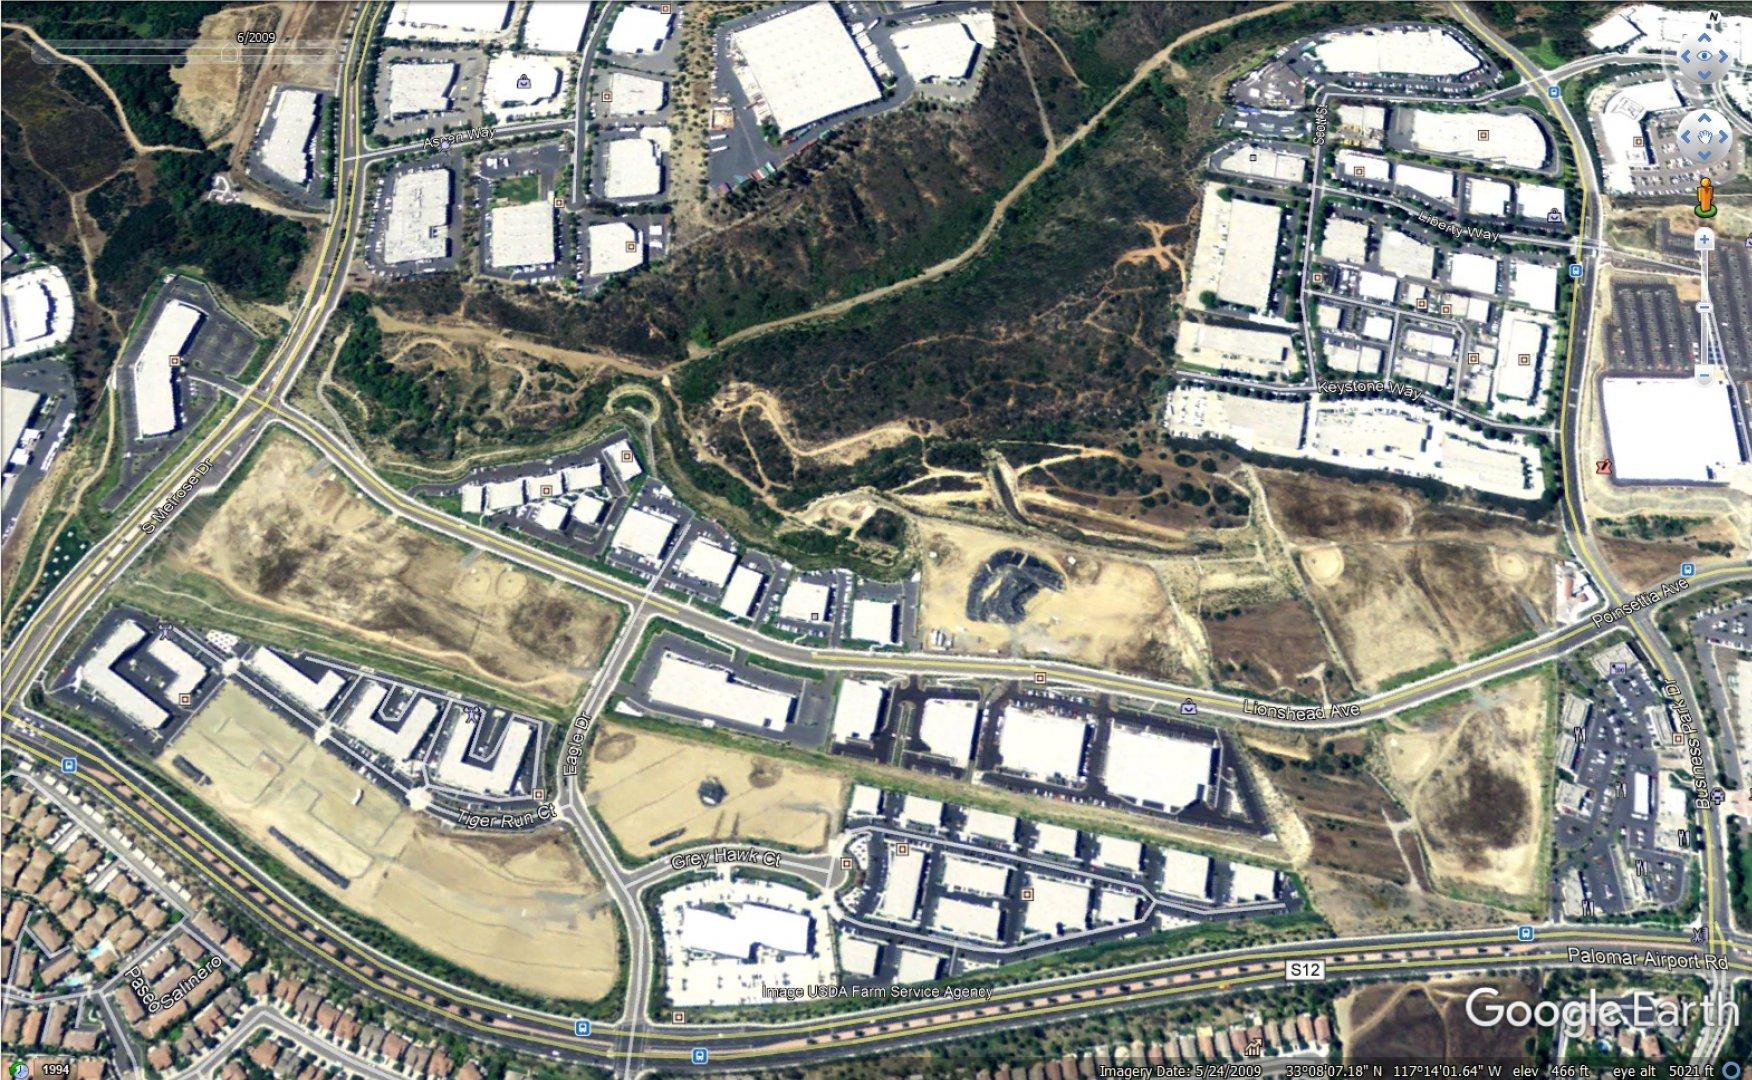 Carlsbad Raceway Google Earth 6-2009.JPG